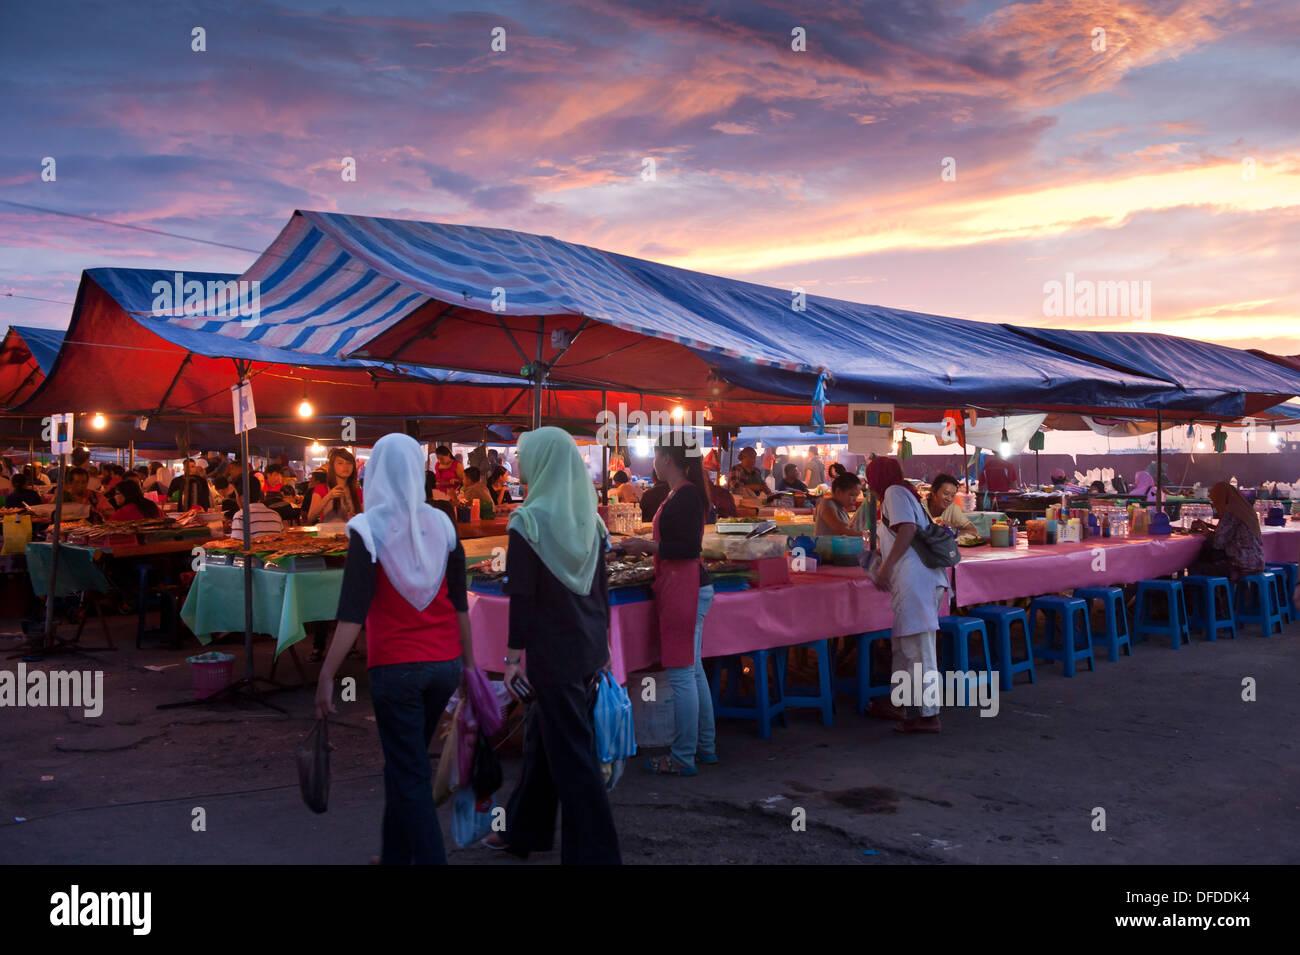 Market at sunset, Kota Kinabalu, Malaysia - Stock Image